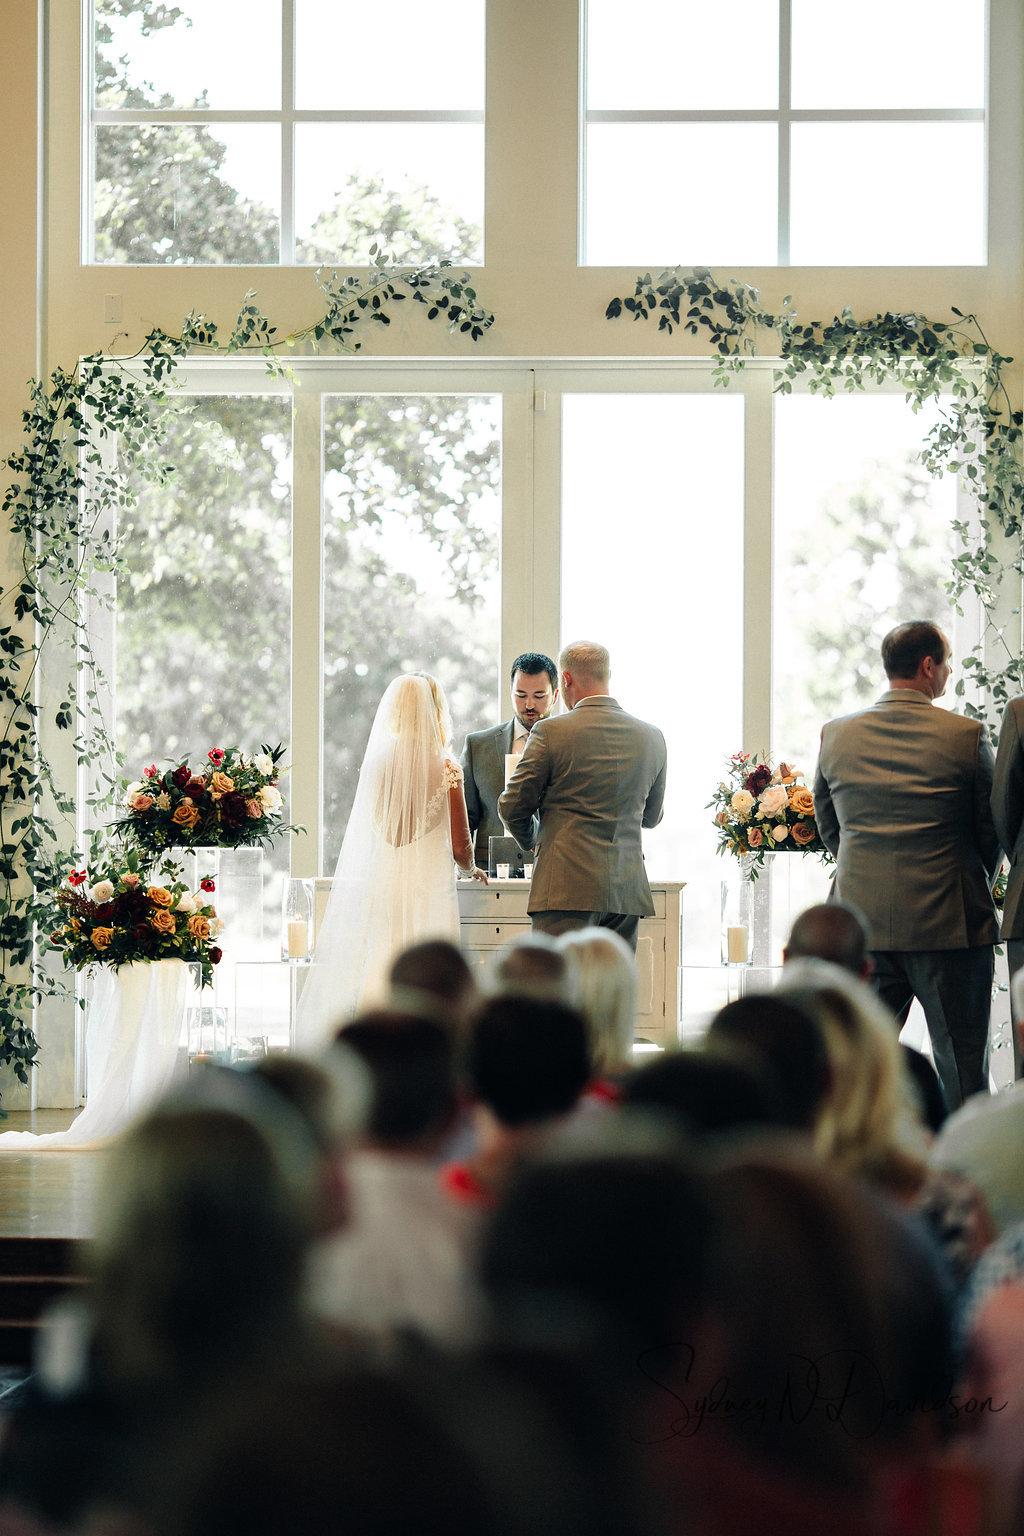 sydney-davidson-wedding-stillwater-oklahoma-wedding-session-traveling-photographer-portrait-tulsa-oklahoma-6392.jpg